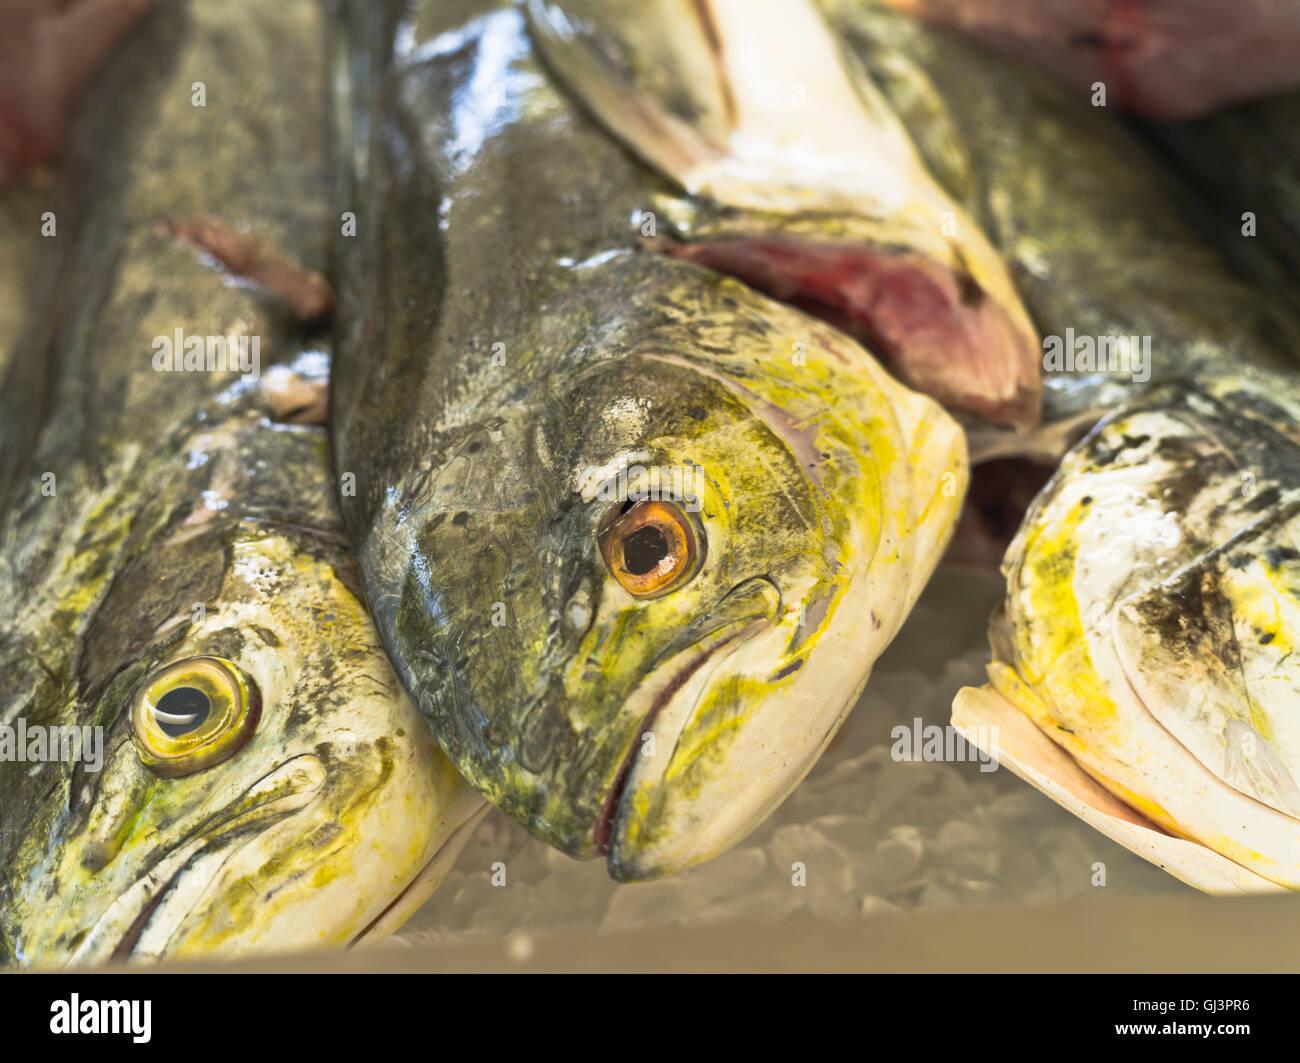 dh St George GRENADA CARIBBEAN Fish market fish heads close up fresh - Stock Image